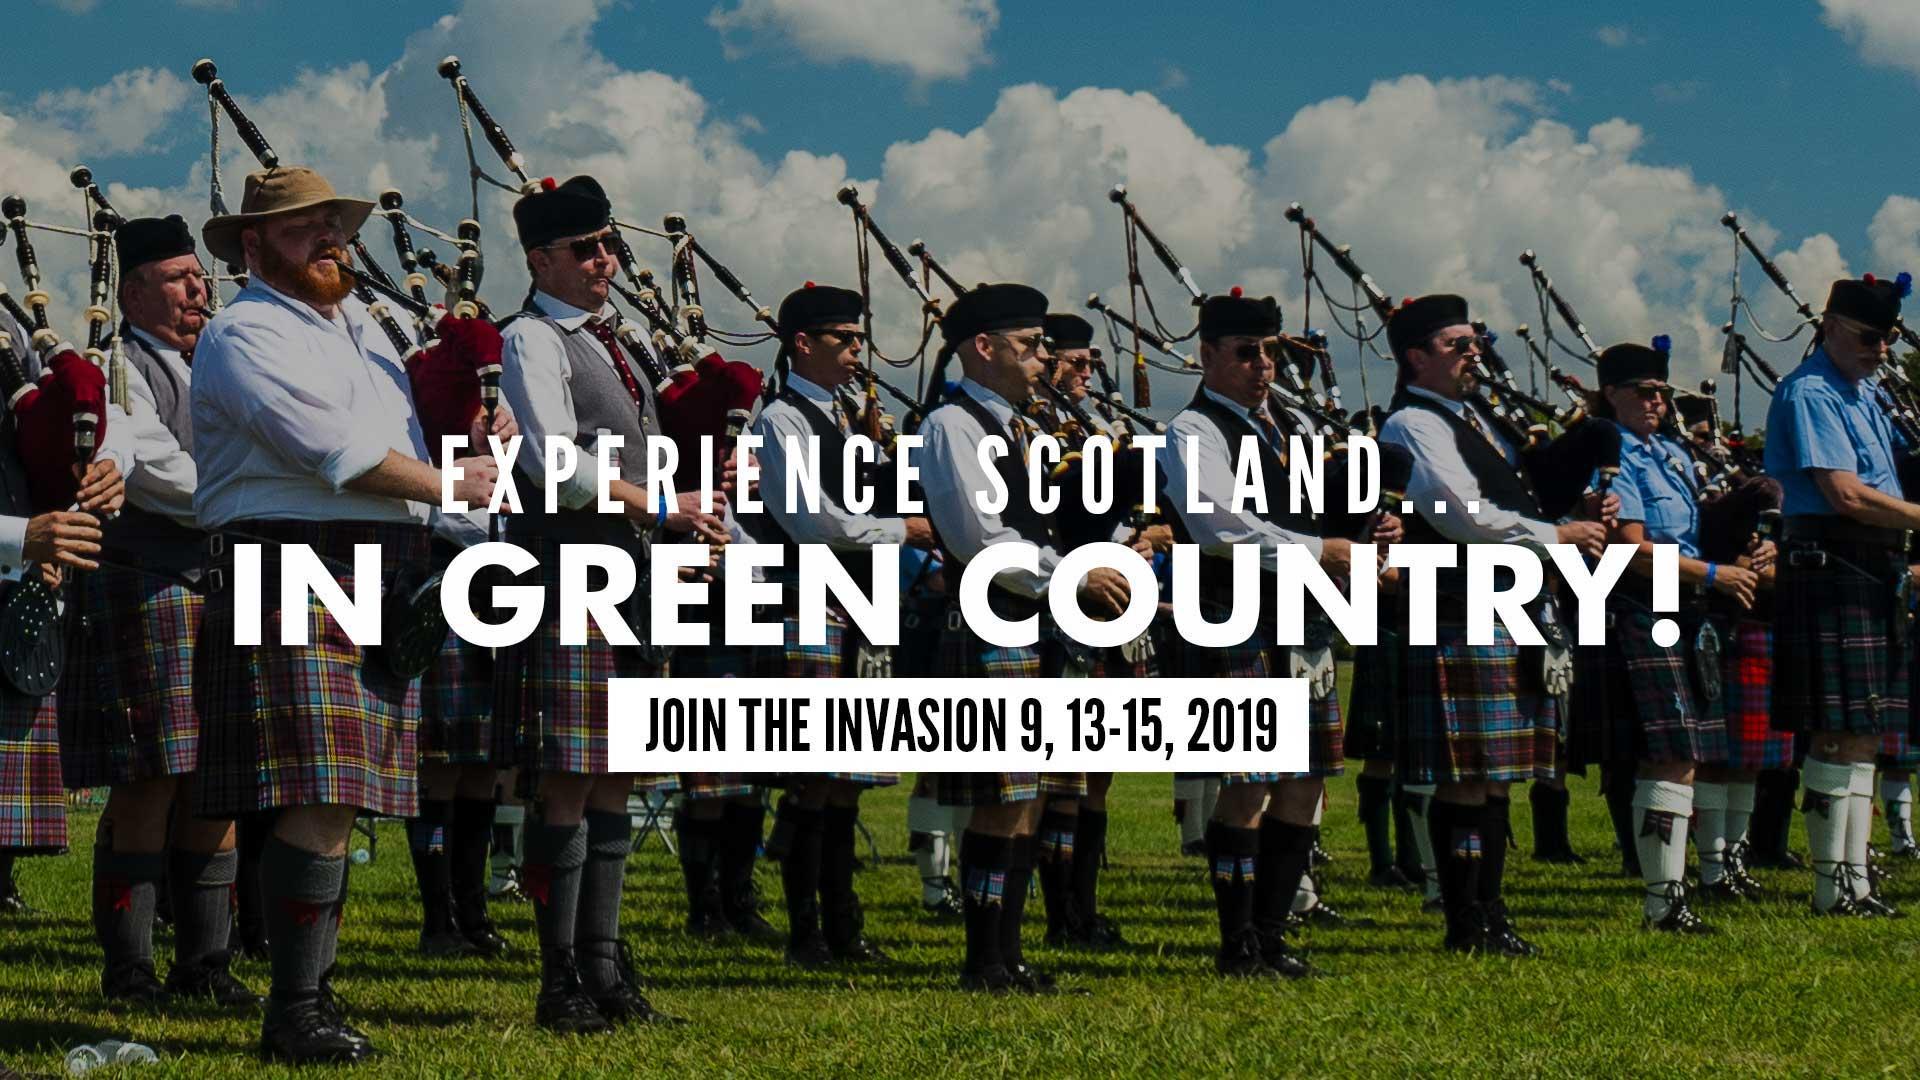 Scotfest Sept 13-15th